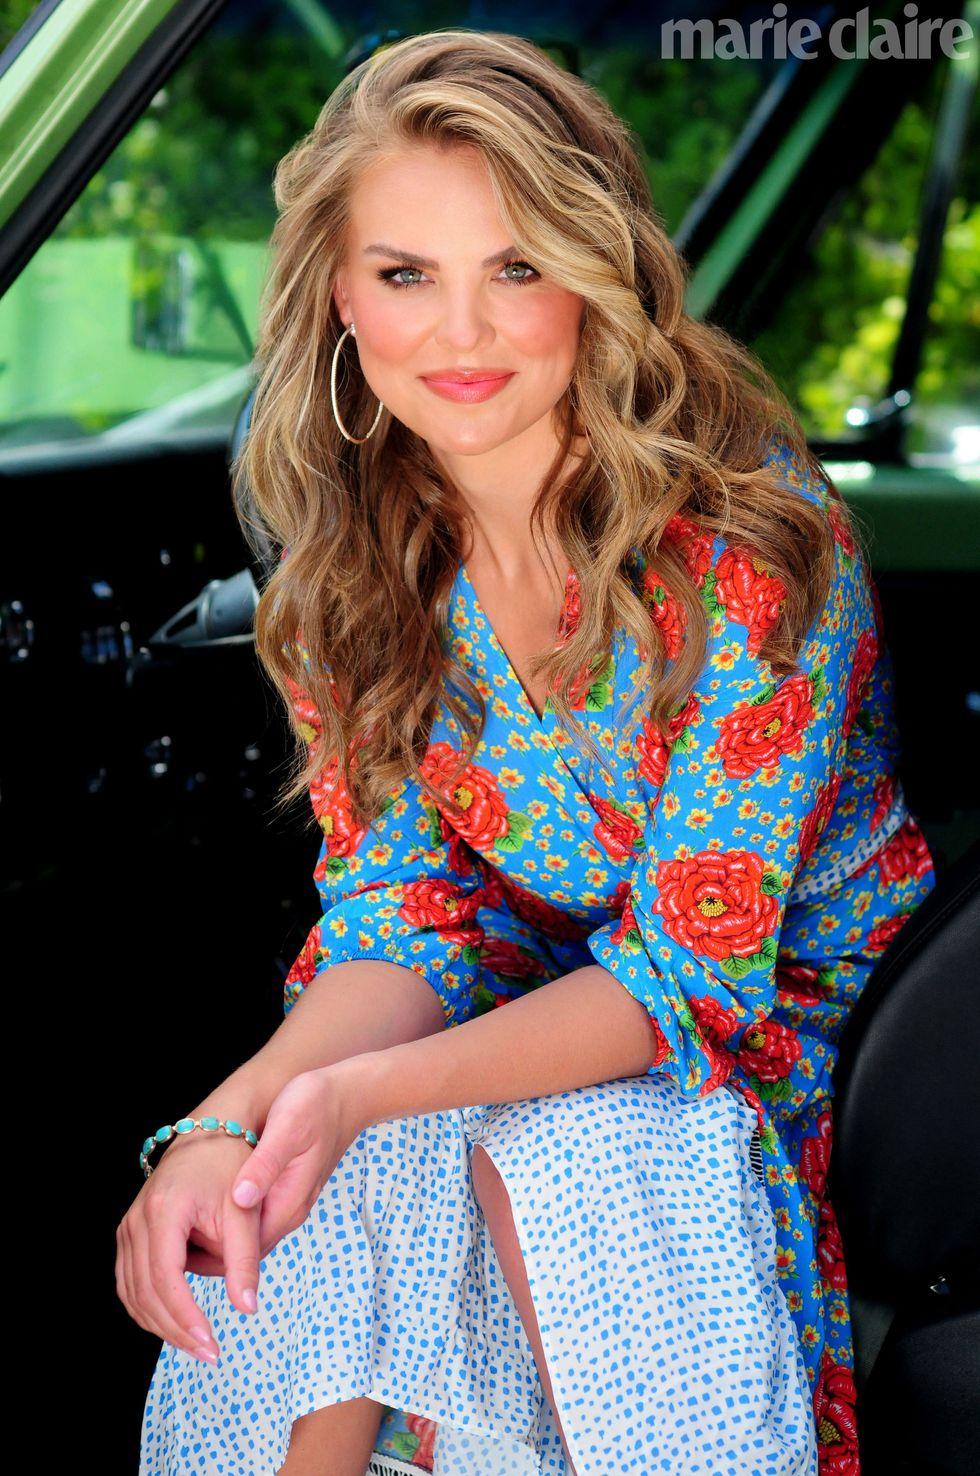 Hannah Brown - Bachelorette 15 - FAN Forum - Discussion  - Page 19 Hananhbrownbyrussellbaer3-wm-1570046448